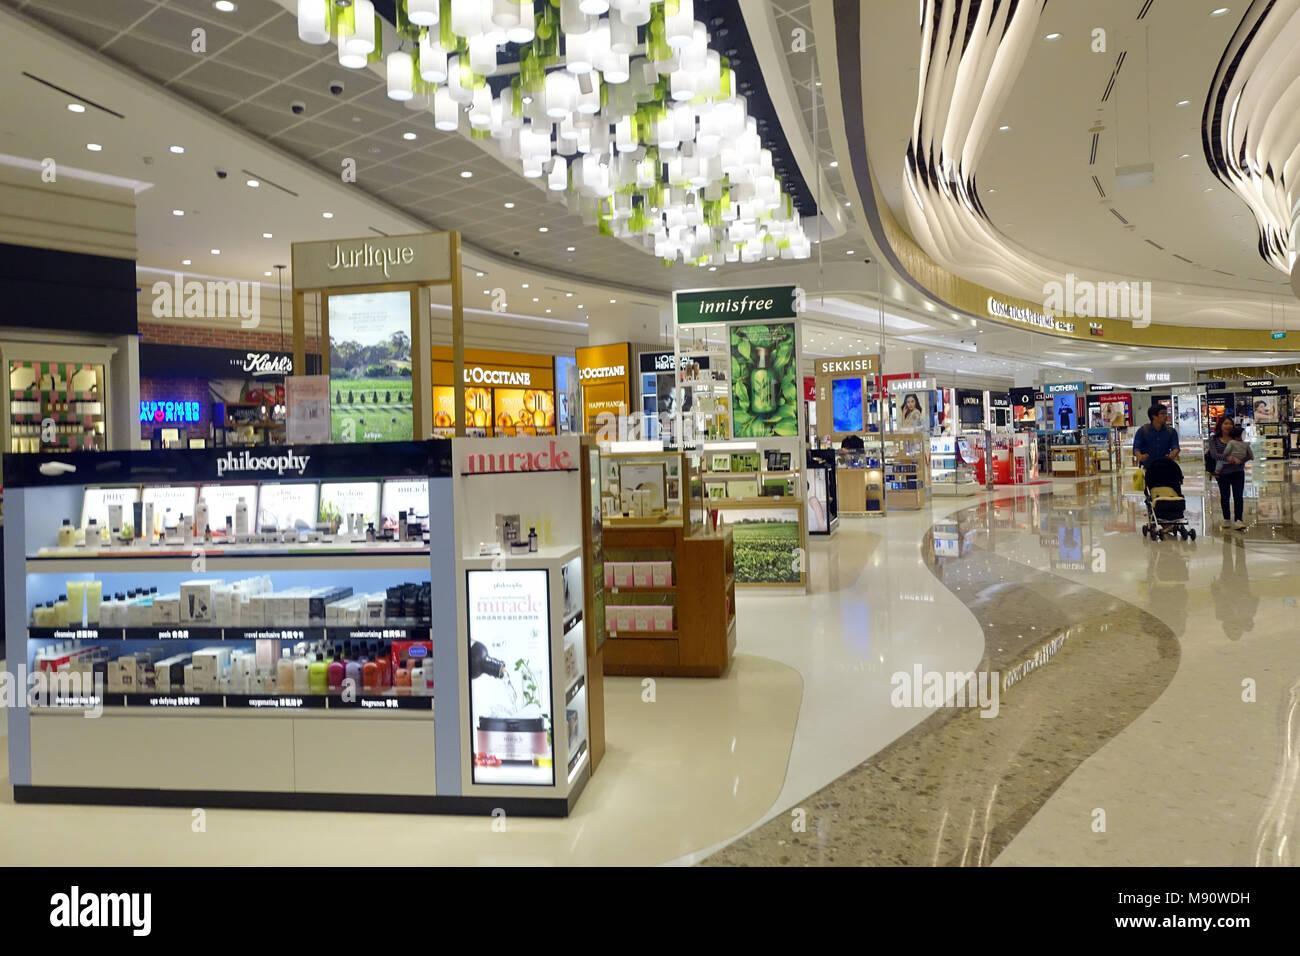 Changi airport.  Duty free shop. Cosmetics.  Singapore. - Stock Image